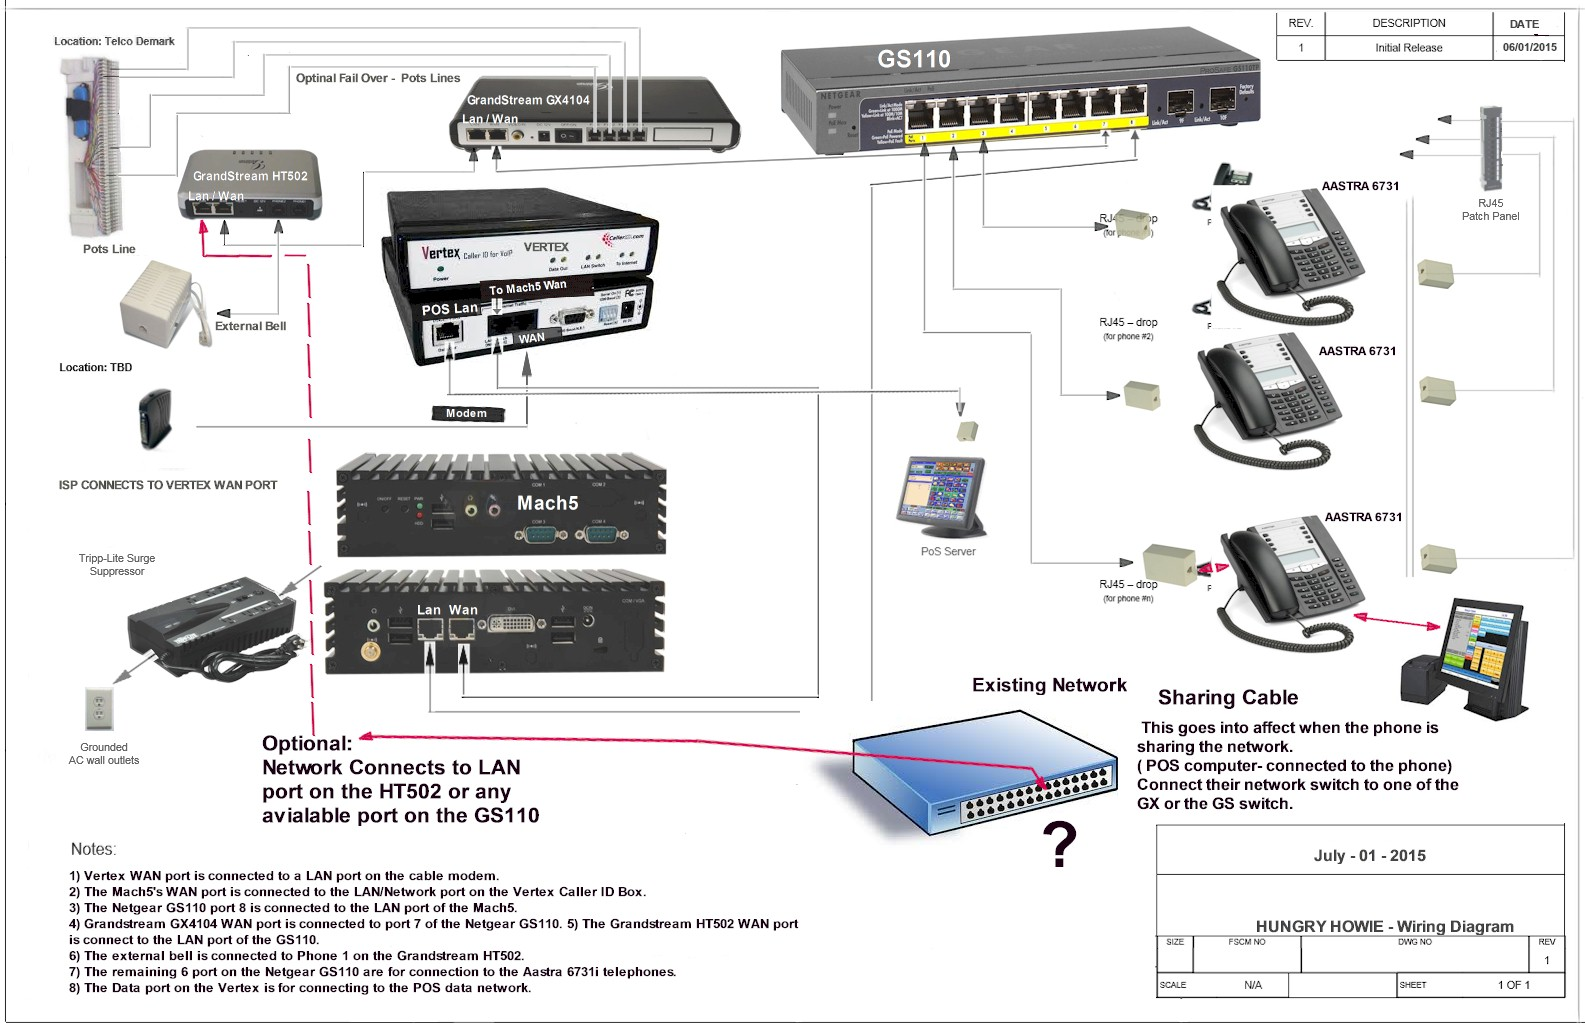 small resolution of wan wiring diagram wiring diagrams lolhungry howie wiring diagram modem diagram 1 vertex wan port